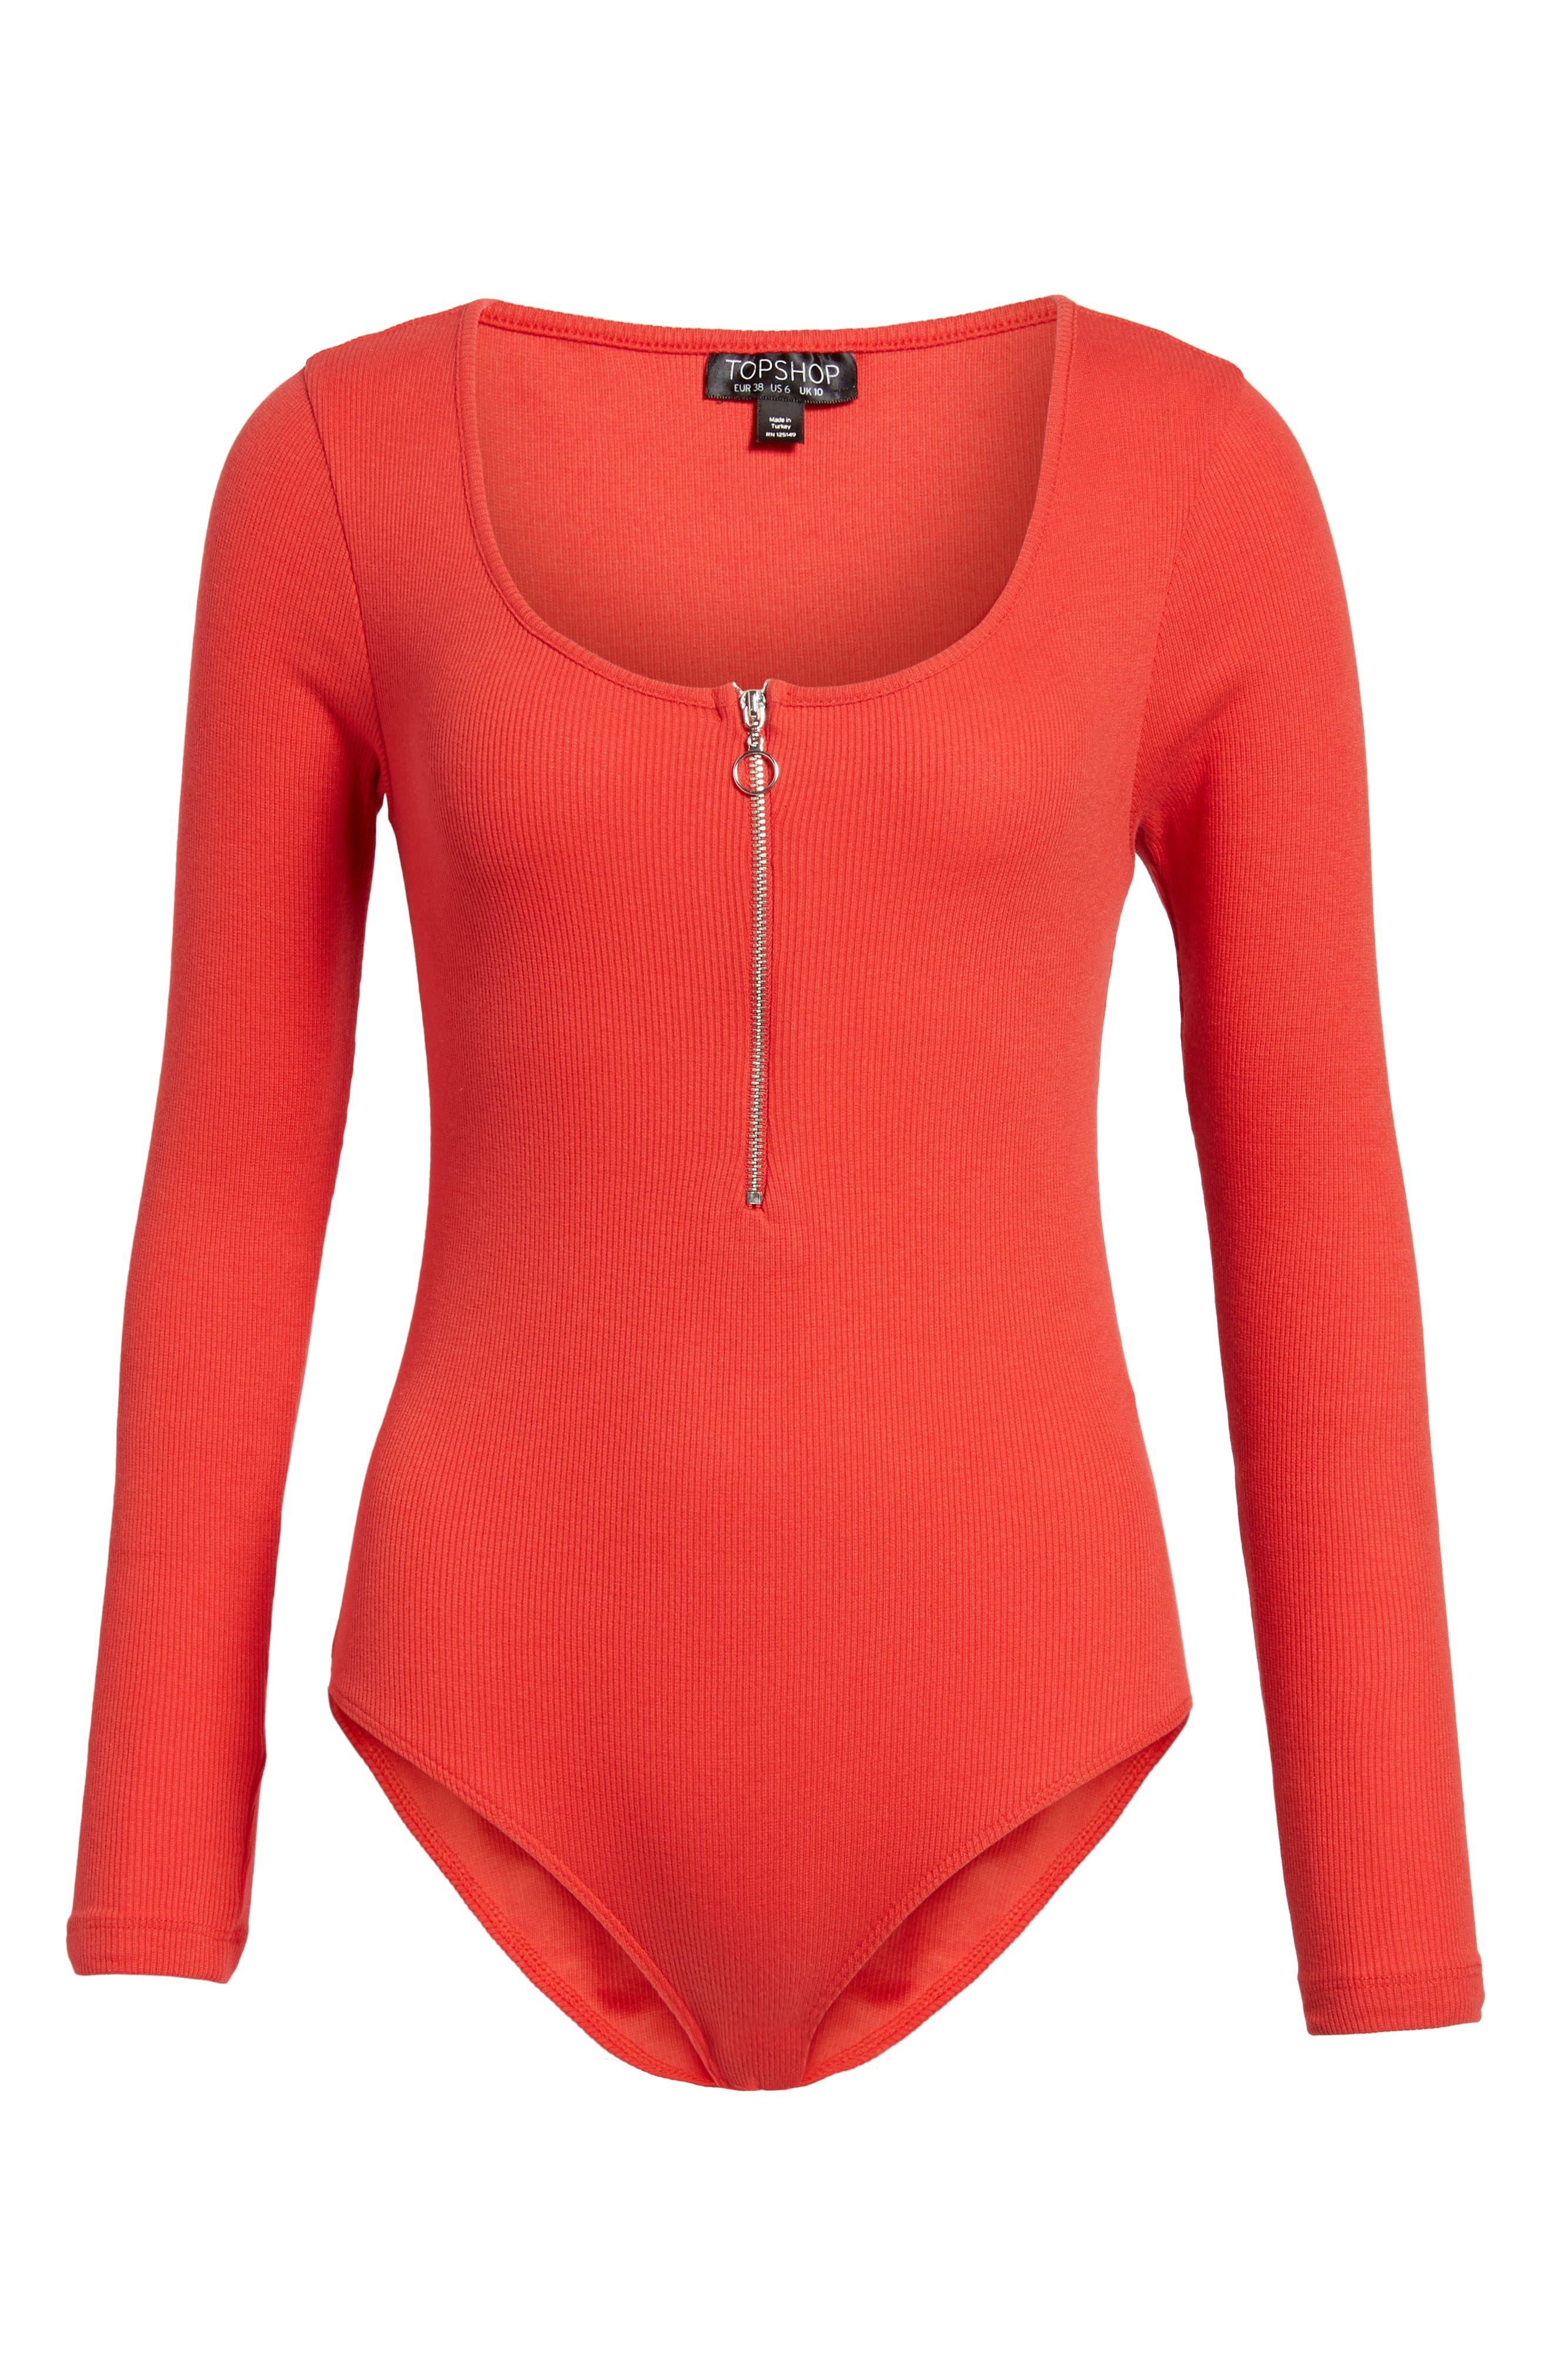 Ring Pull Zip Bodysuit,                             Alternate thumbnail 6, color,                             Red